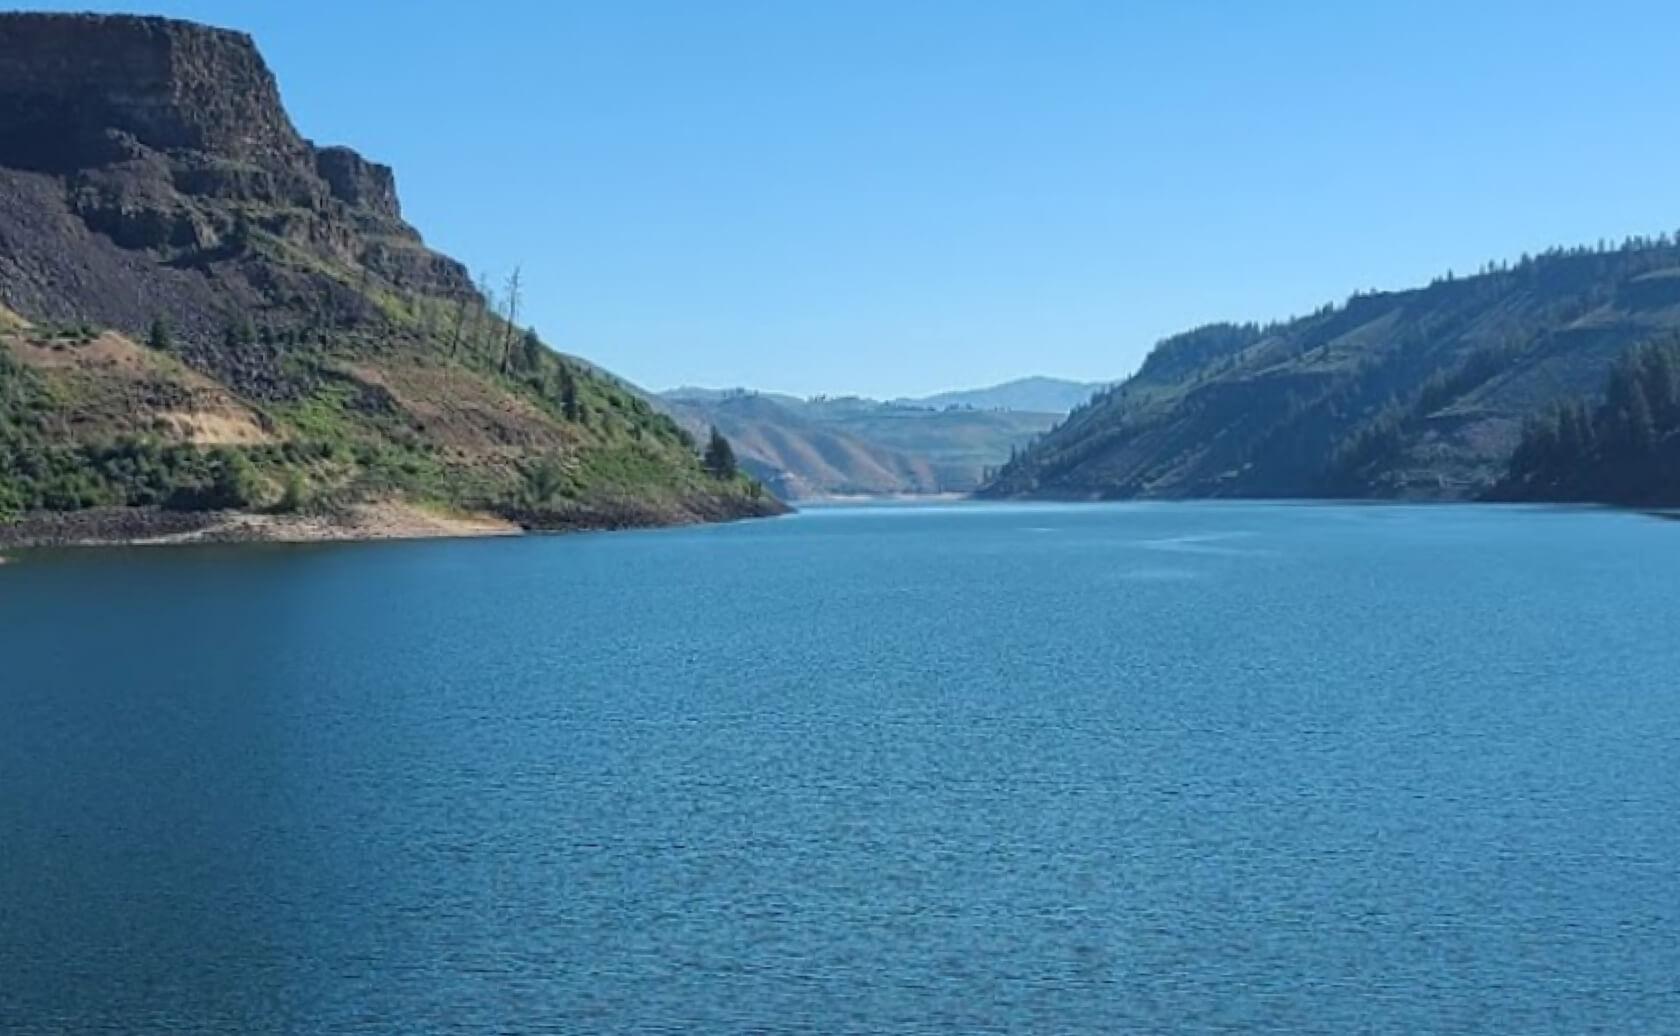 Anderson-Ranch-Lake-Fishing-Guide-Report-Idaho-04